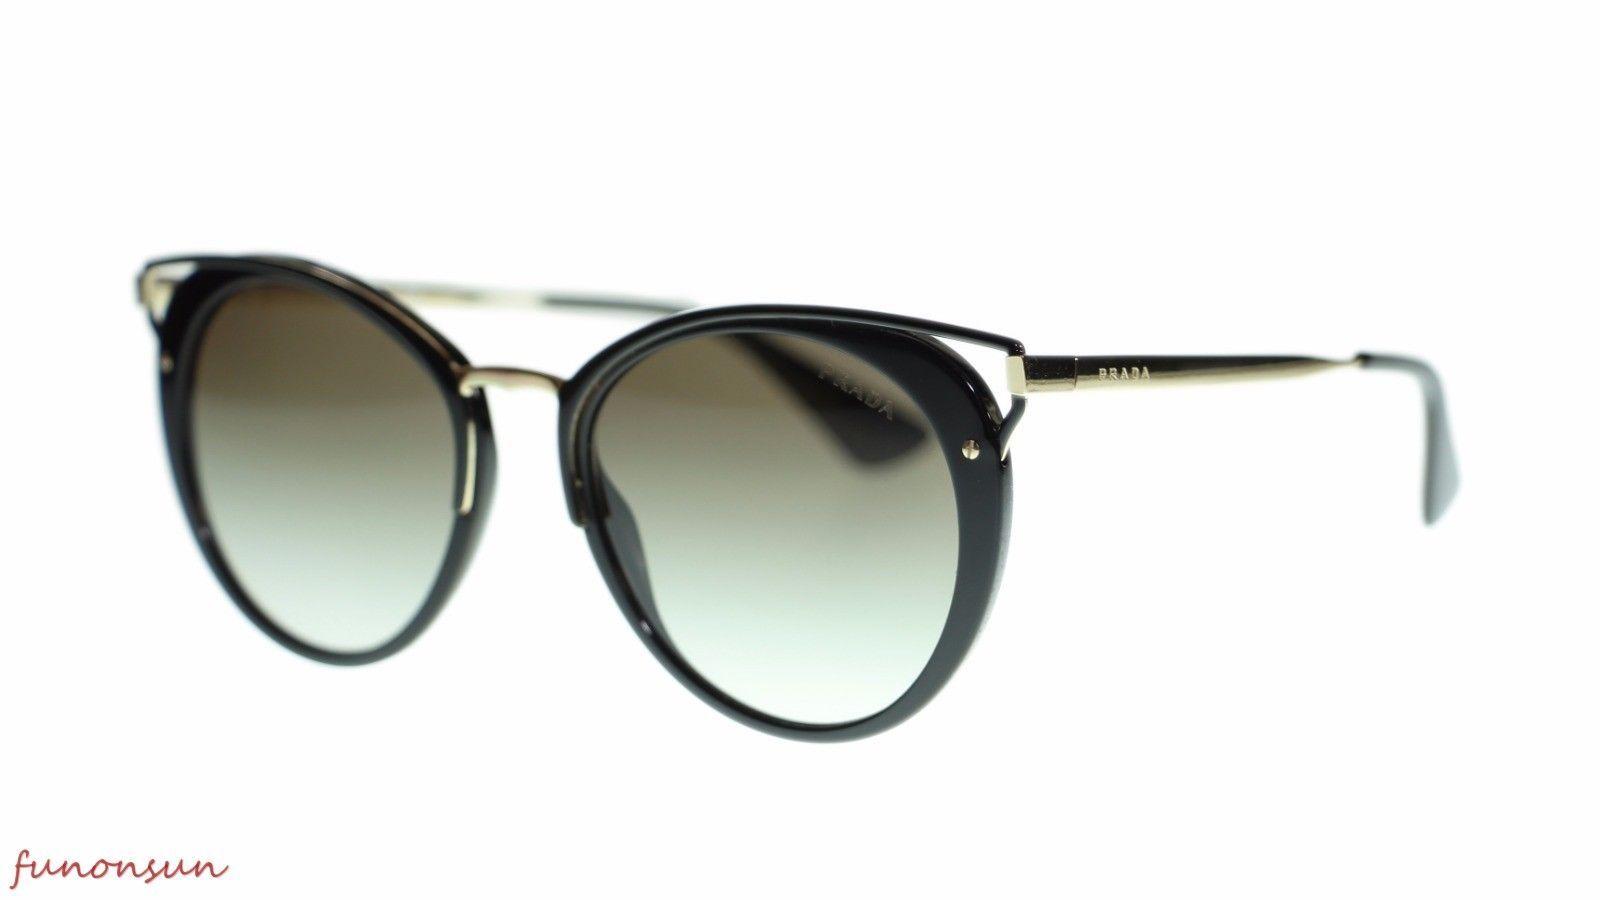 d132229d786bdd Prada Phantos Womens Sunglasses PR66TS 1ABA7 Black Grey Gradient 54mm -   231.83